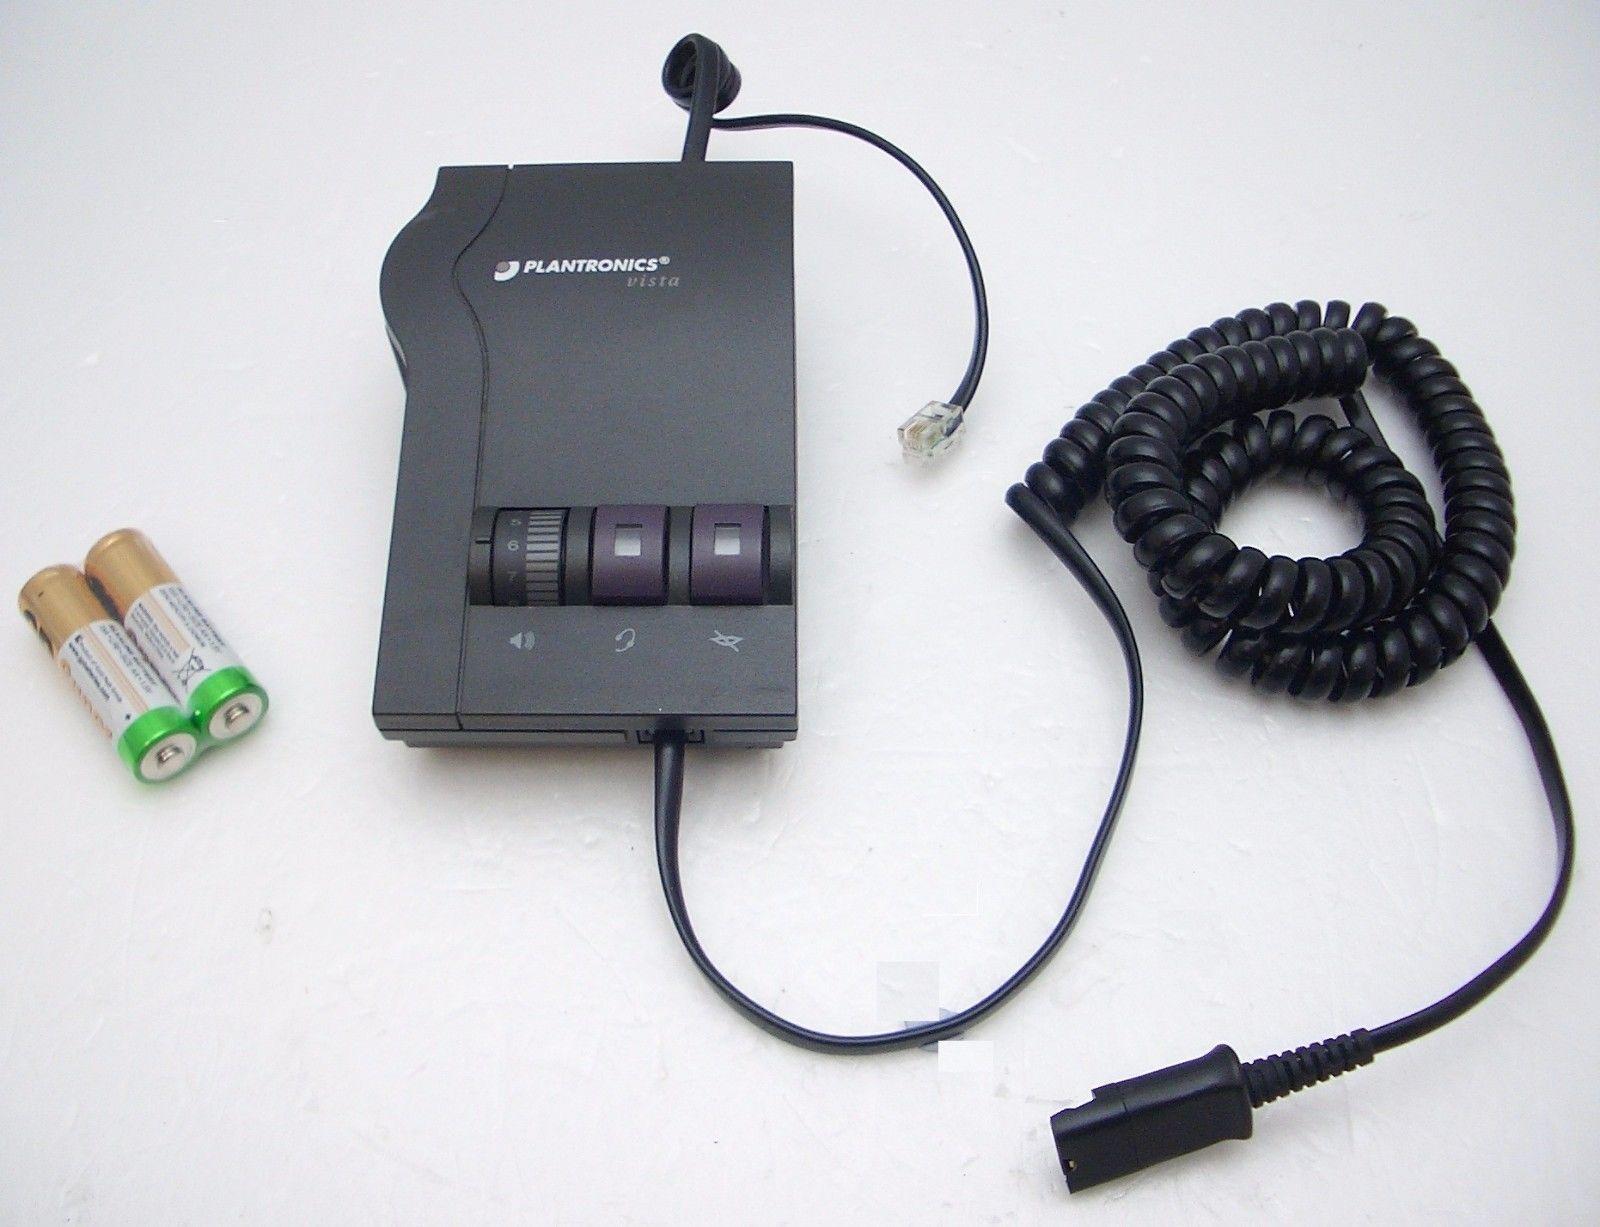 Plantronics Vista M12 Multi Purpose Adapter for HW510 HW520 HW710 HW720 Headsets